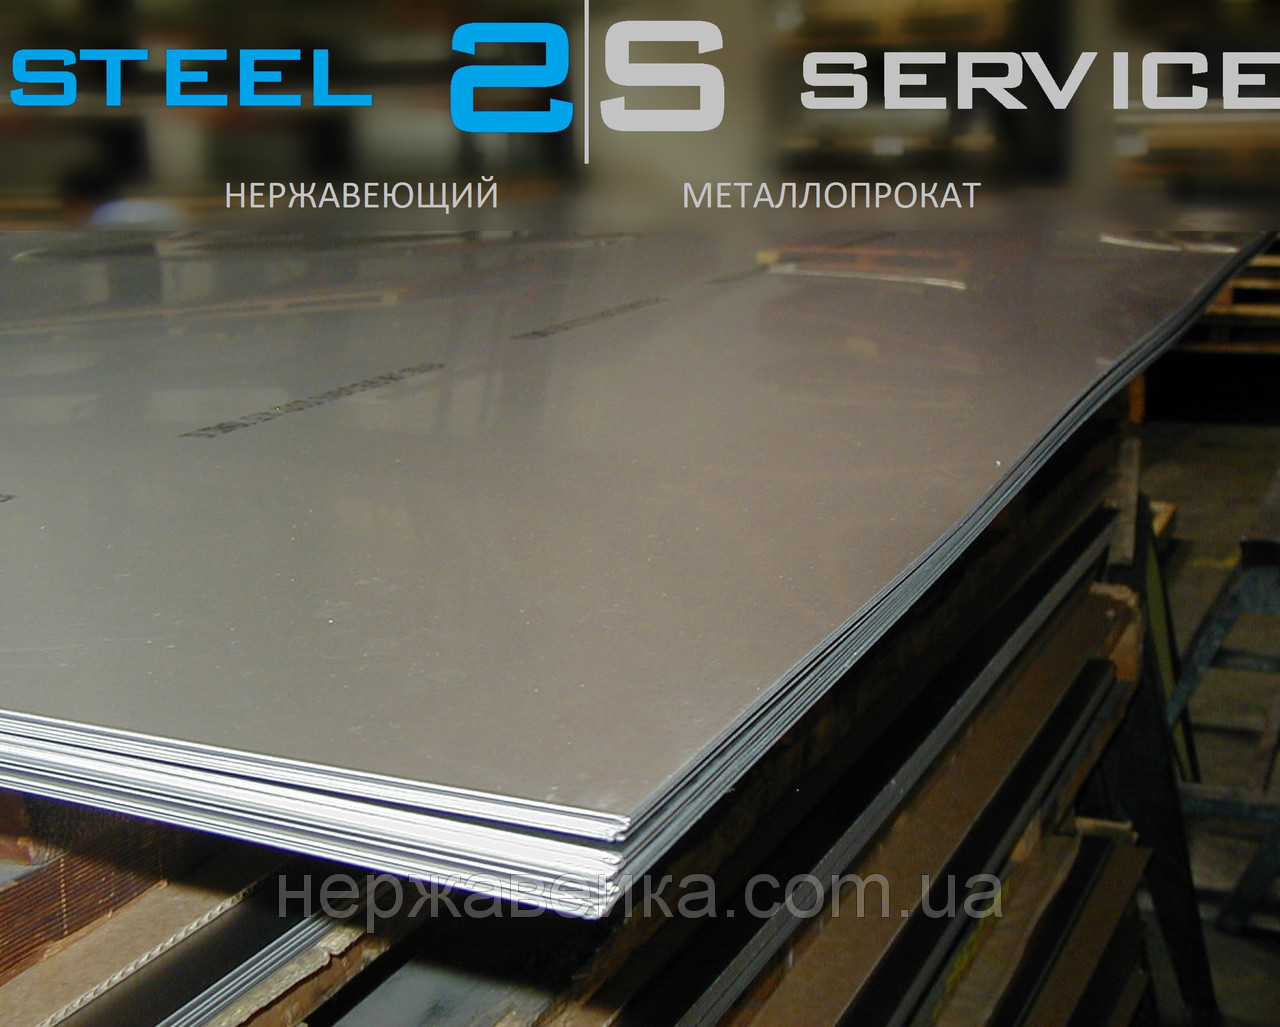 Листовая нержавейка 0,8х1500х3000мм AISI 430(12Х17) BA - зеркало, технический